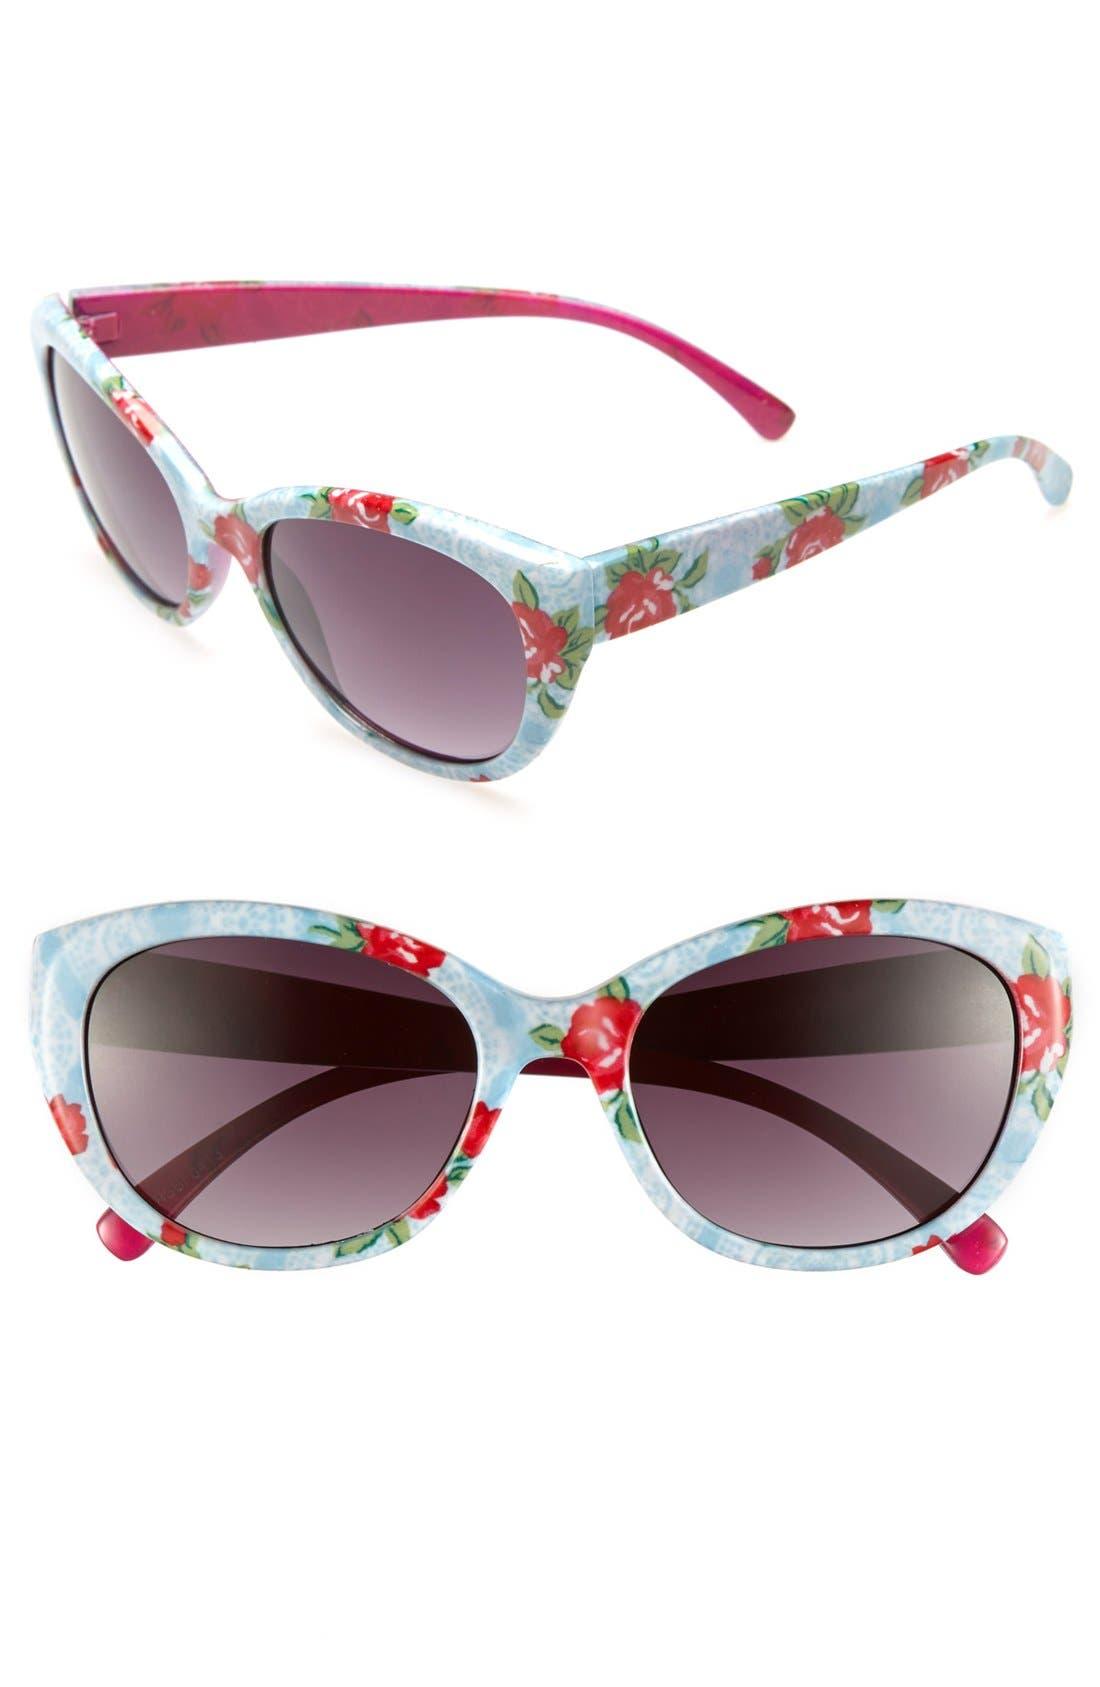 Alternate Image 1 Selected - Fantas Eyes Cat's Eye Sunglasses (Girls)